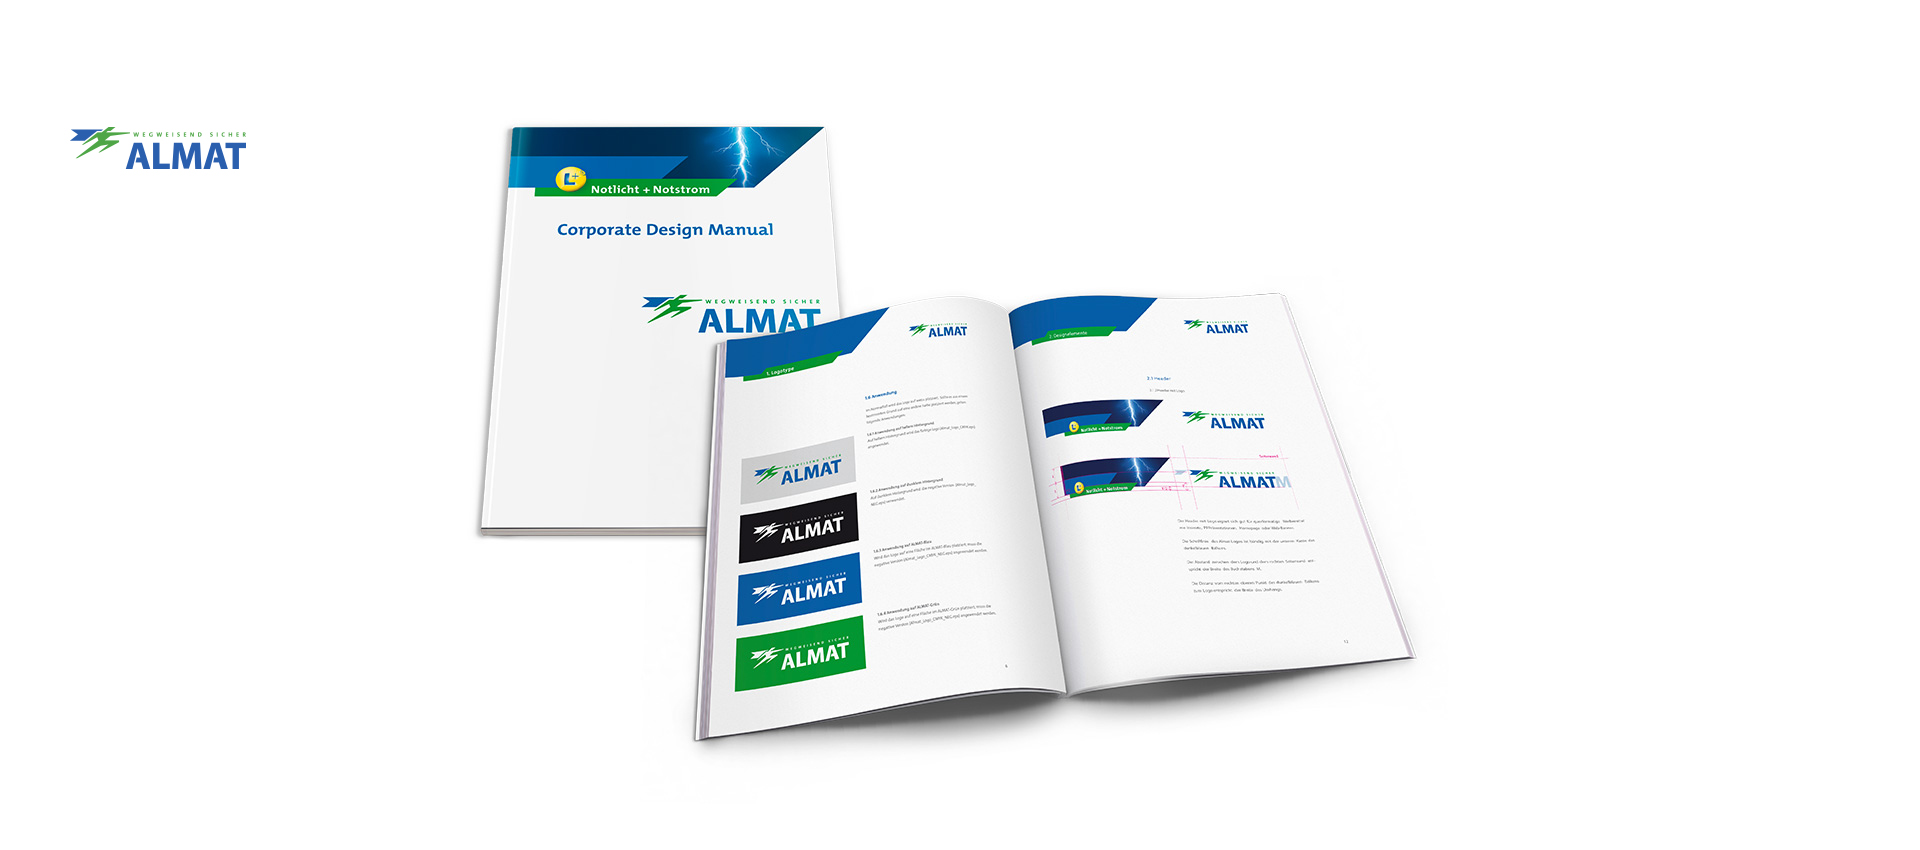 Almat_CDManual_eingemittet1